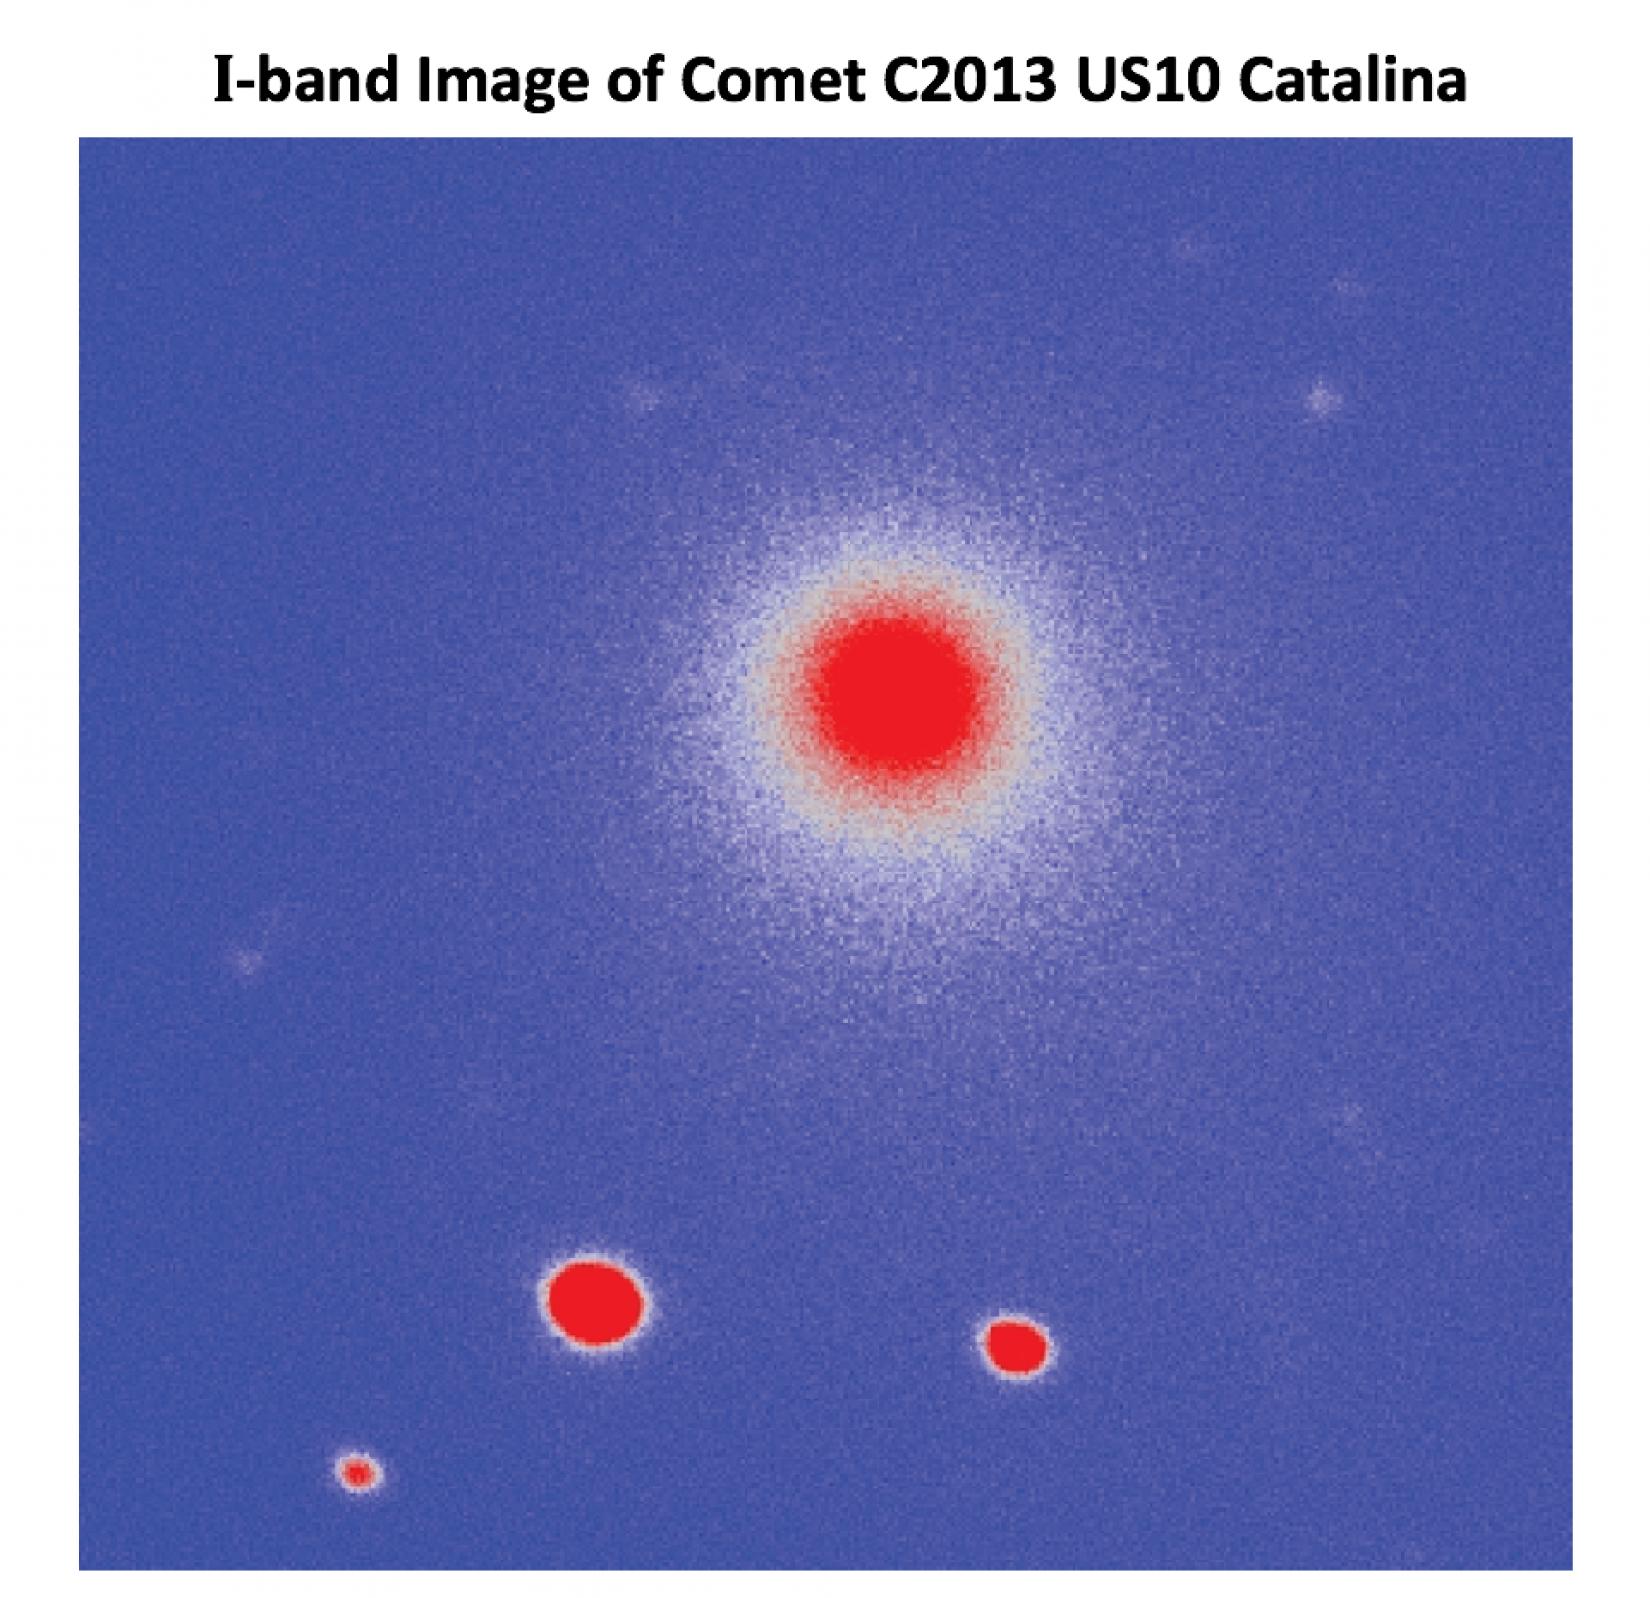 C2013 US10 Catalina Coma